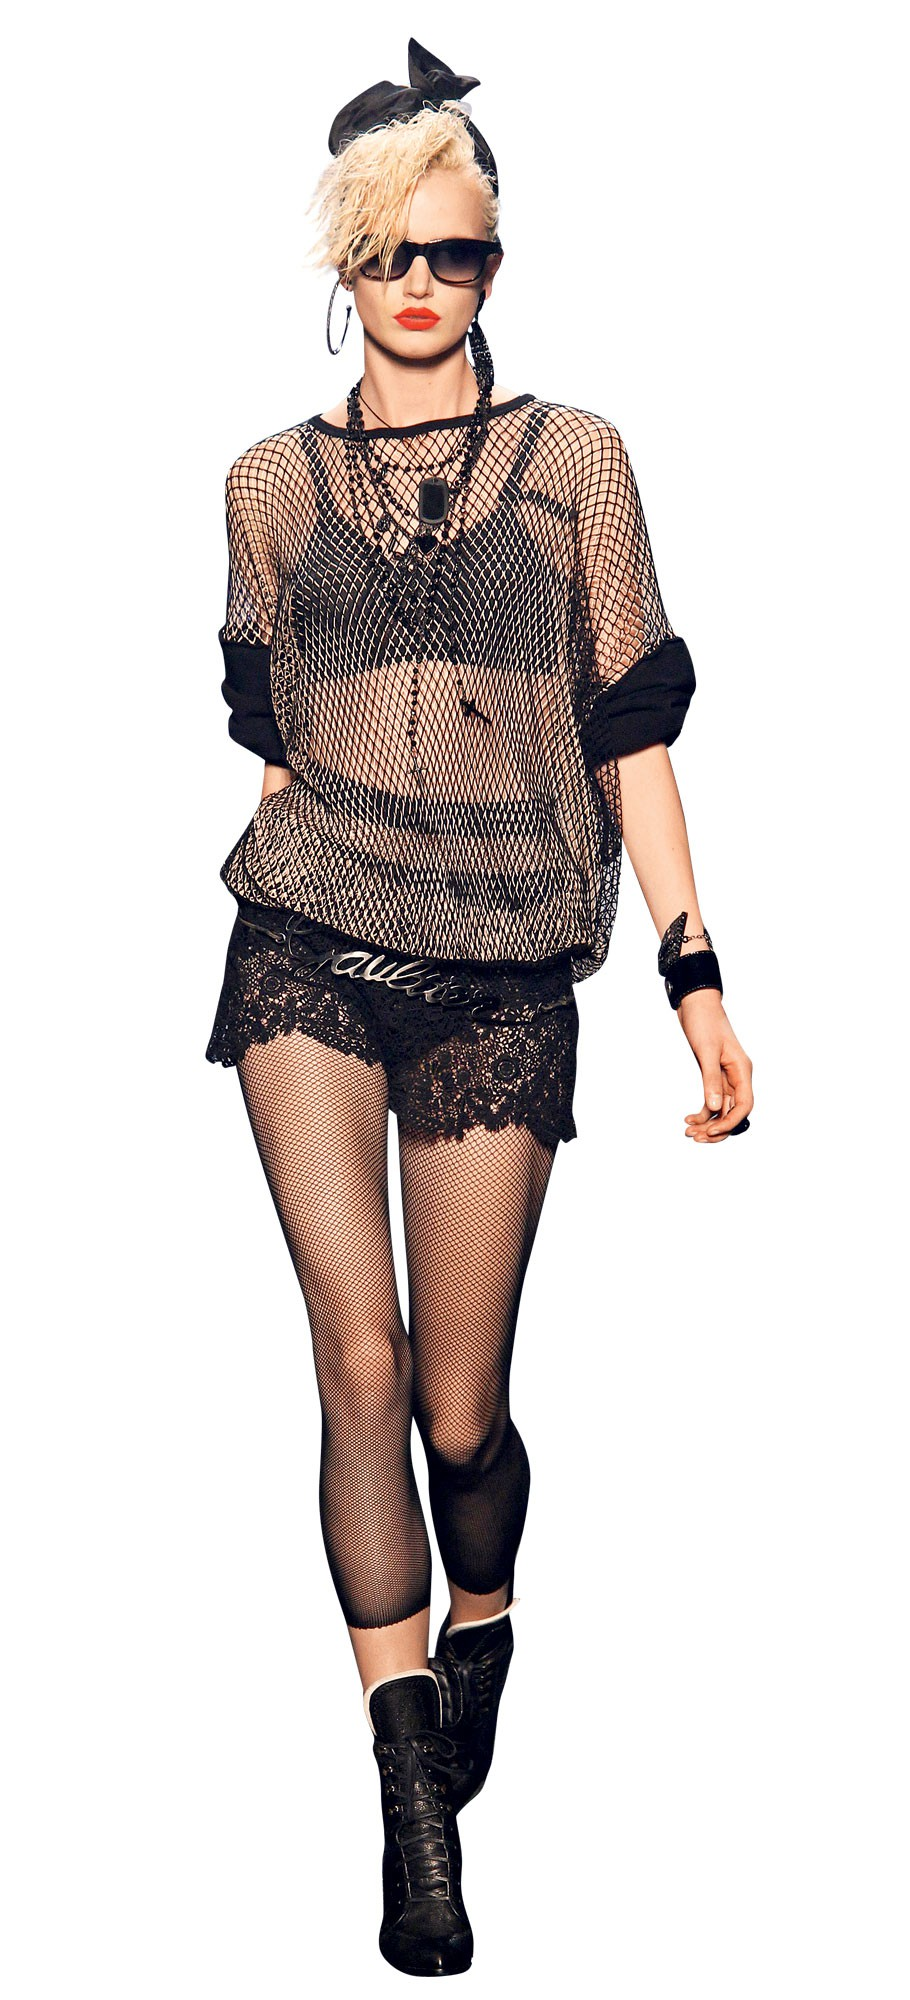 Gaultier (foto: All about fashion, primož predalič, promocijsko gradivo)